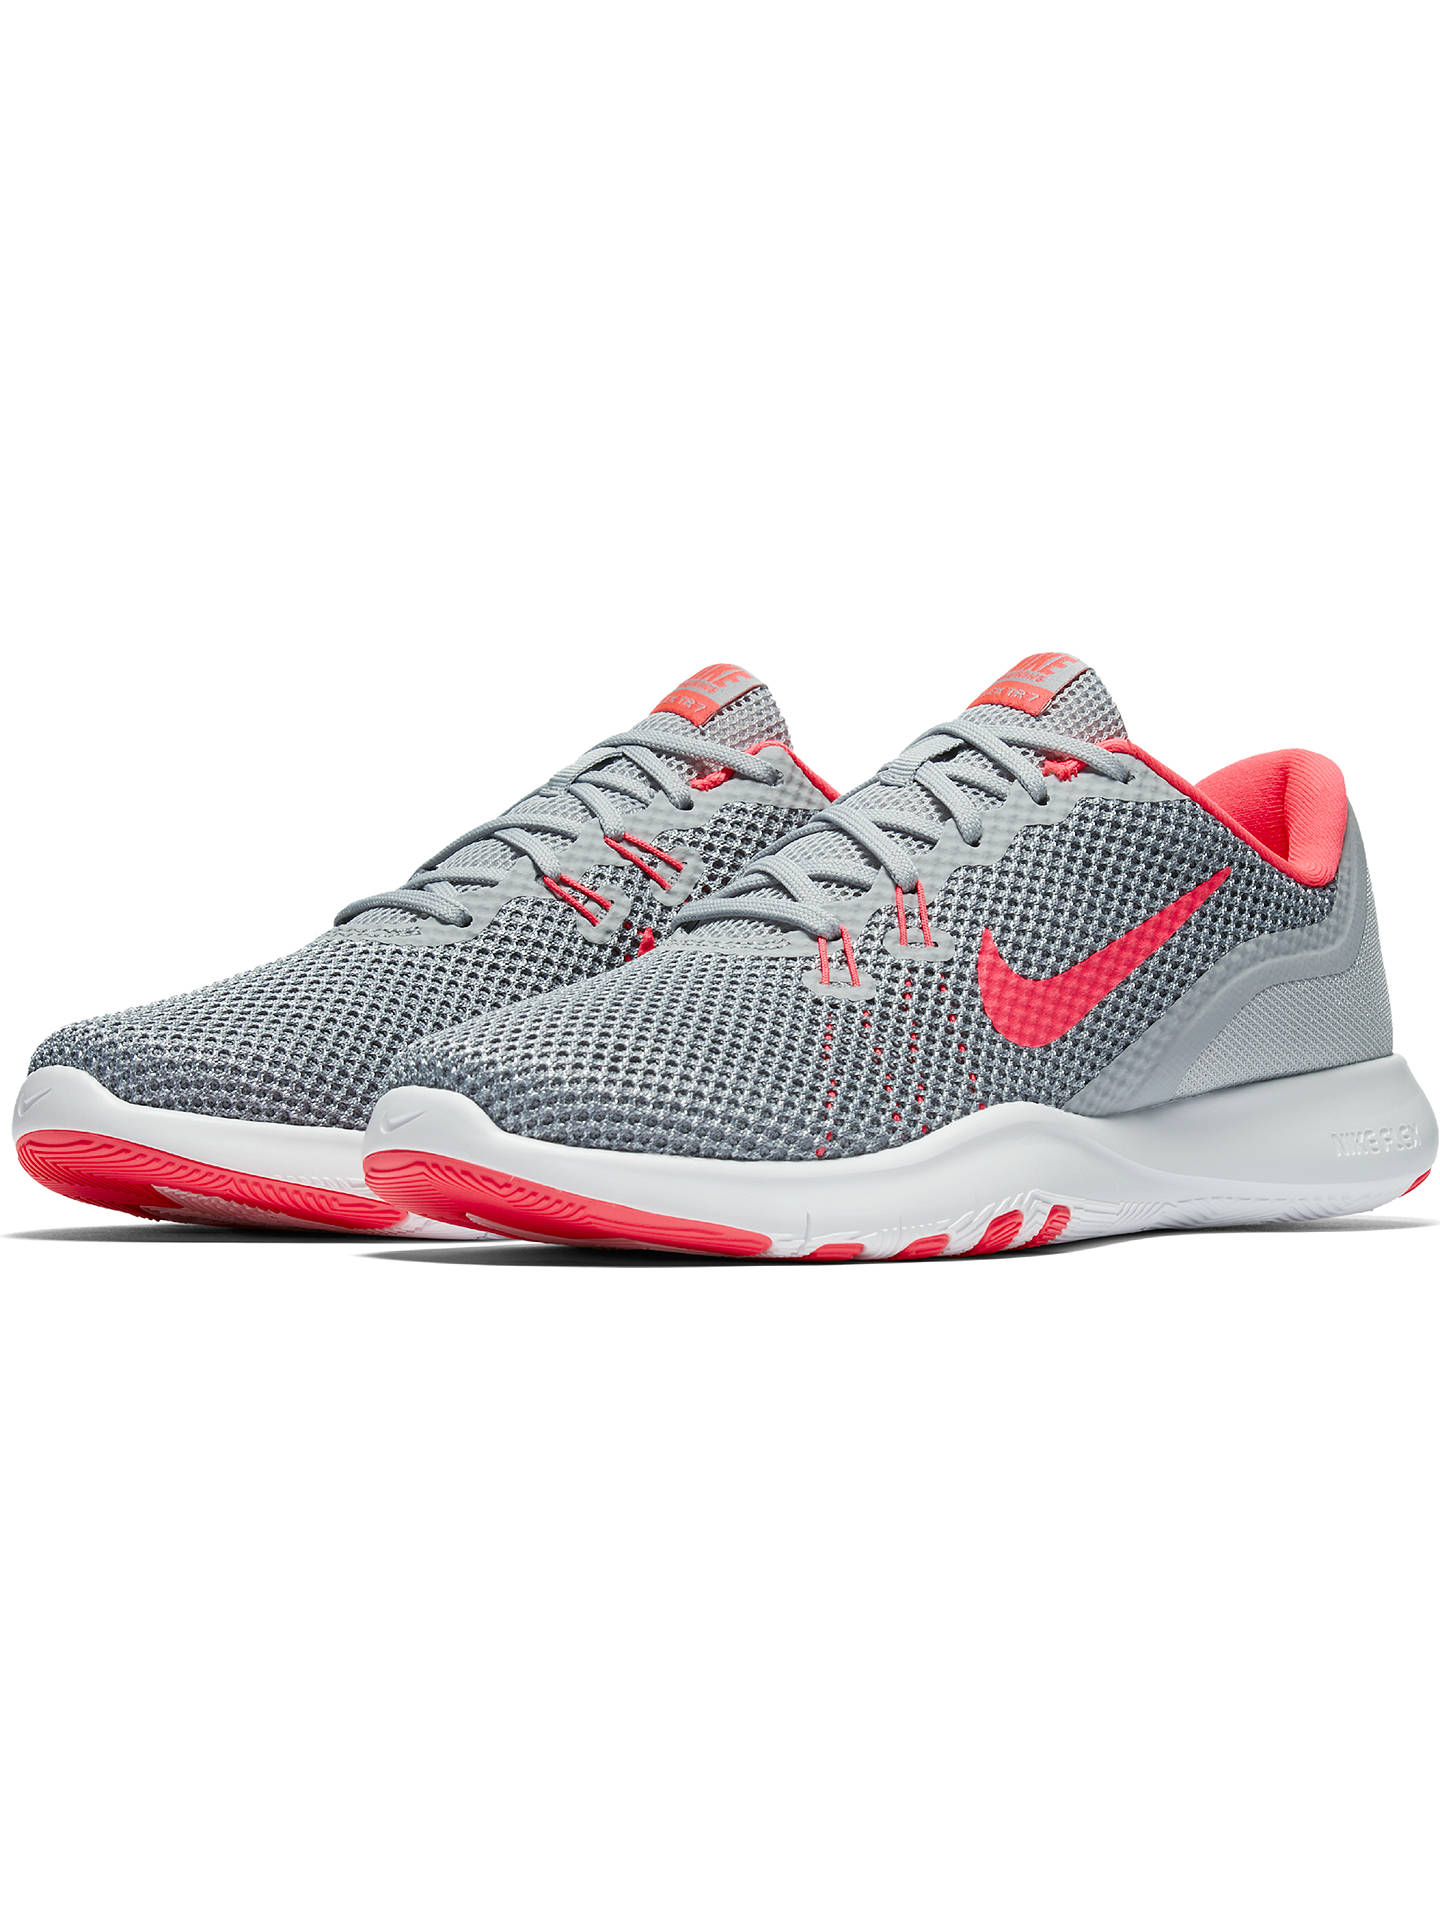 648cdb3371dc ... Buy Nike Flex TR 7 Women s Cross Trainers